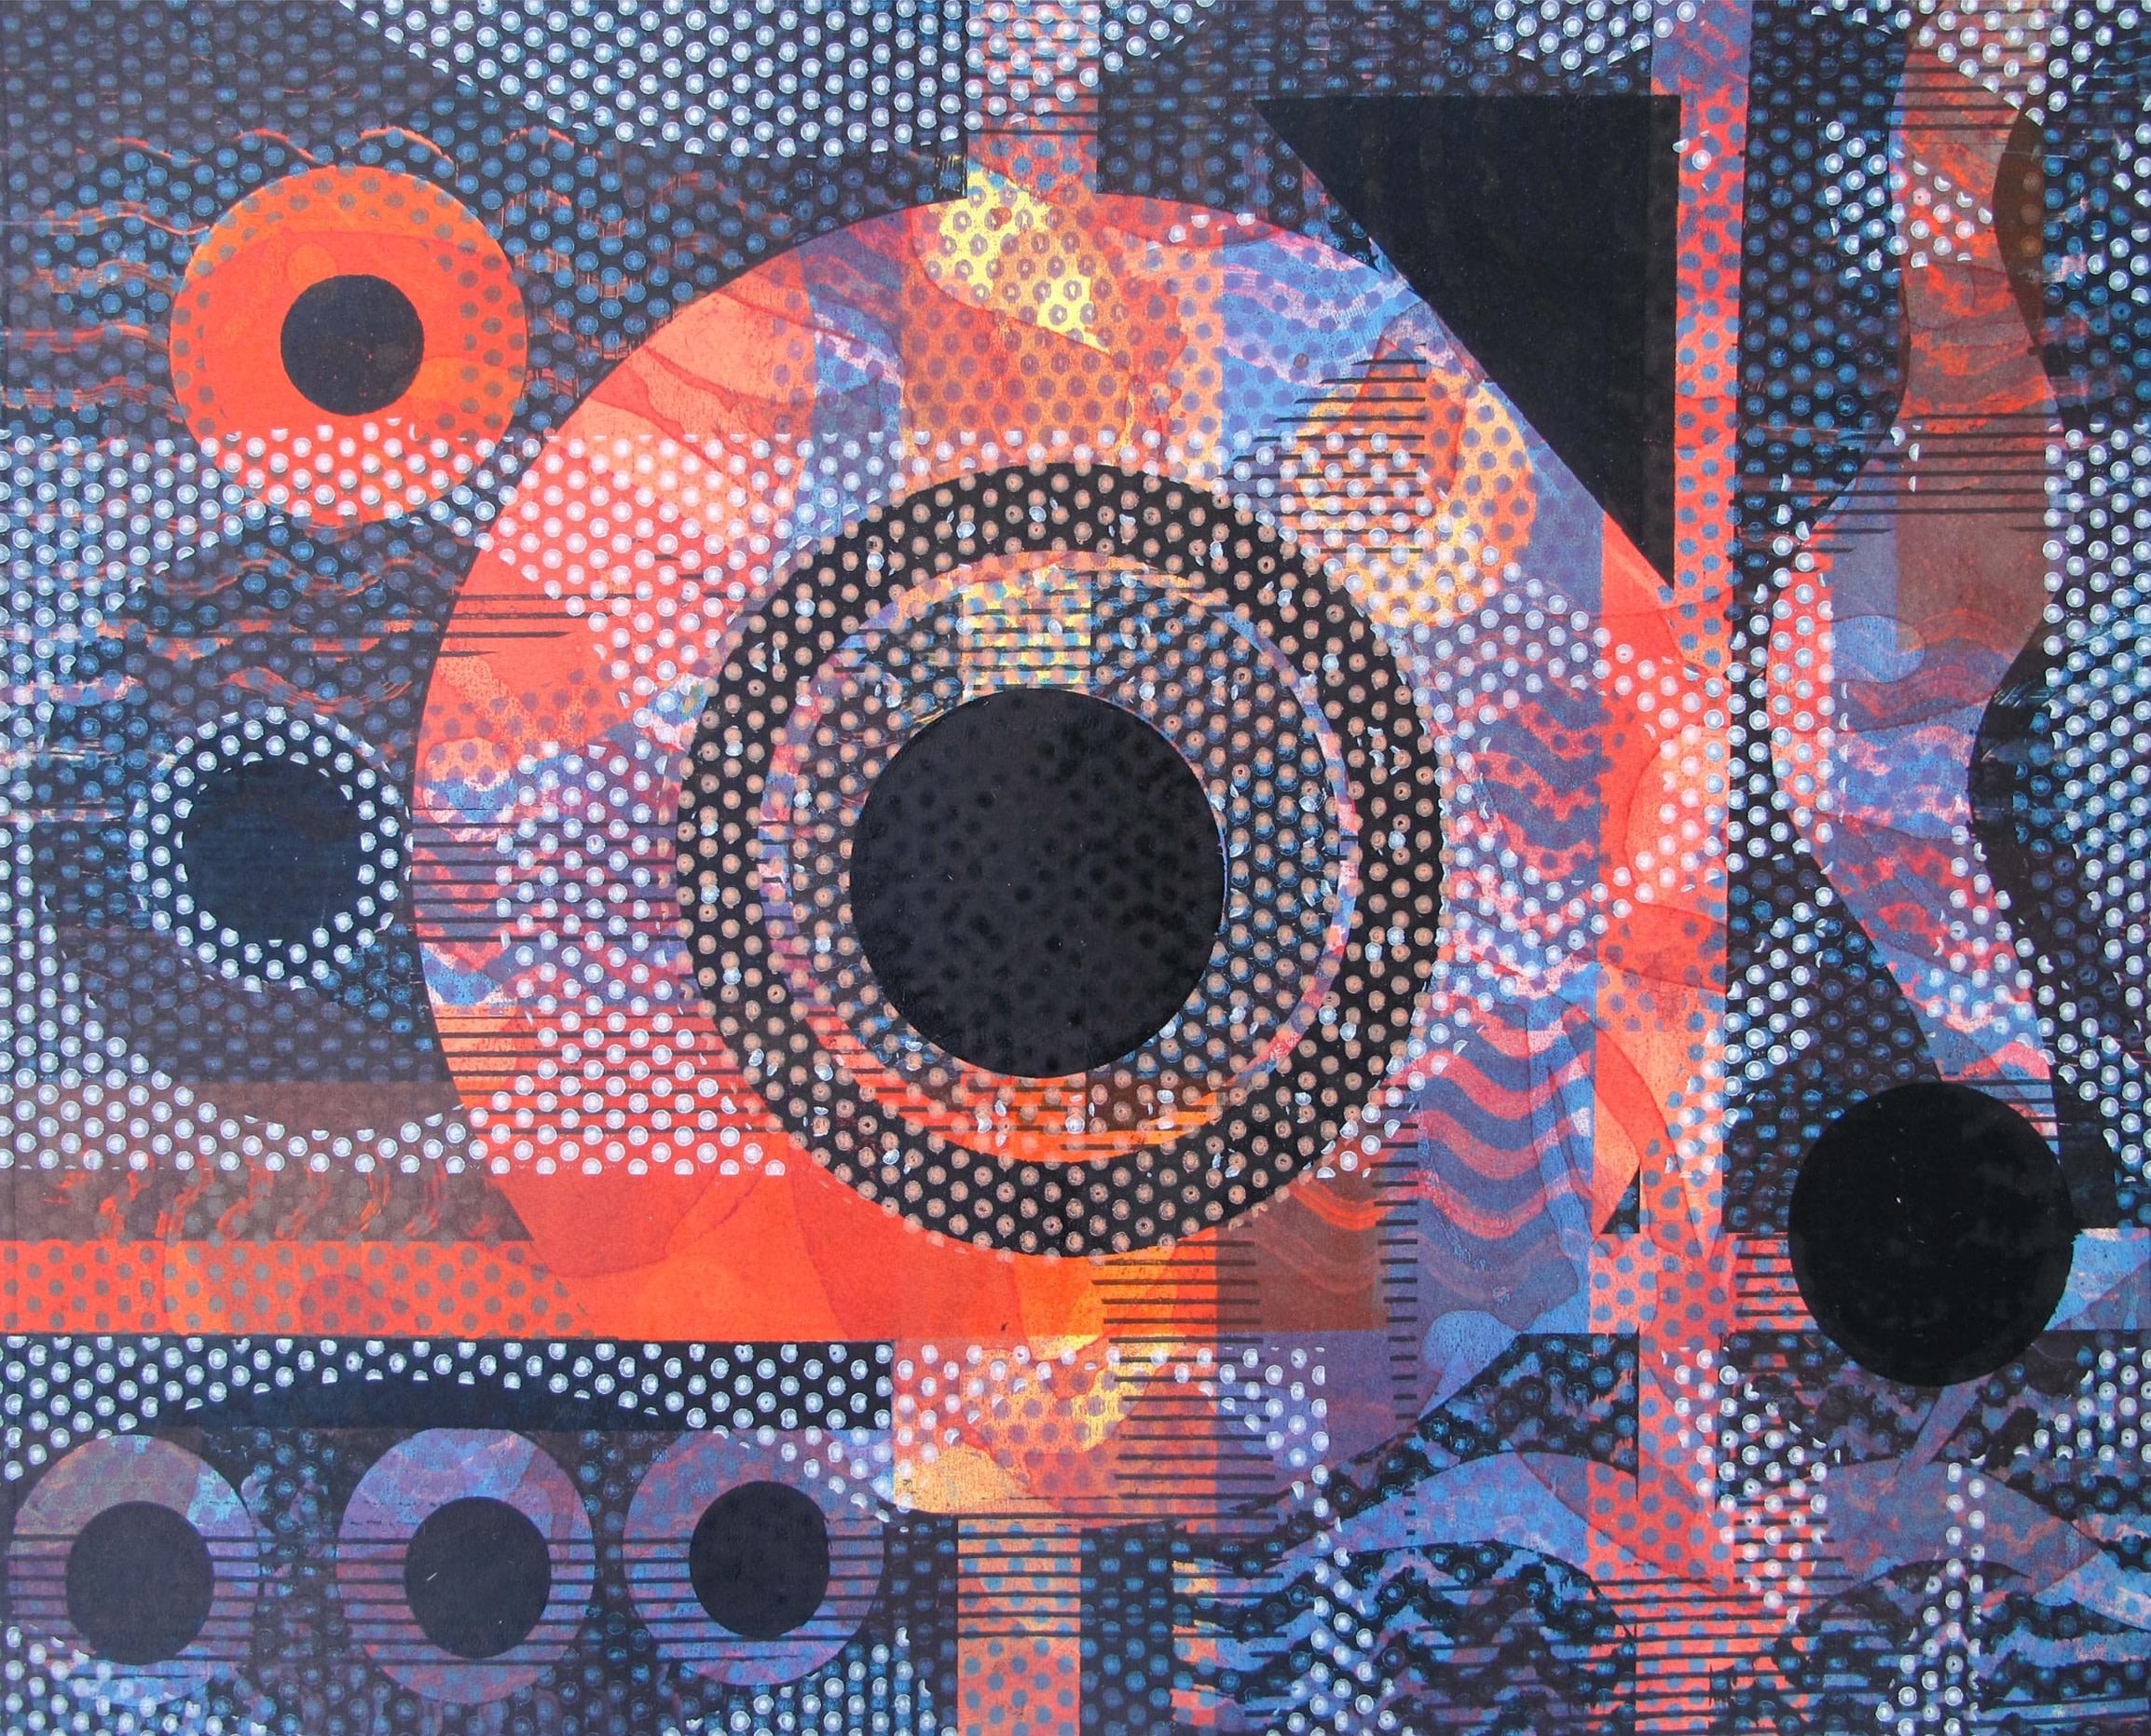 "<span class=""link fancybox-details-link""><a href=""/exhibitions/22/works/artworks_standalone11129/"">View Detail Page</a></span><div class=""artist""><span class=""artist""><strong>Paul Thirkell RE</strong></span></div><div class=""title""><em>Unseen</em></div><div class=""medium"">monoprint</div><div class=""dimensions"">38 x 47 cm framed size<br>32 x 41 cm image size</div><div class=""edition_details"">unique</div>"